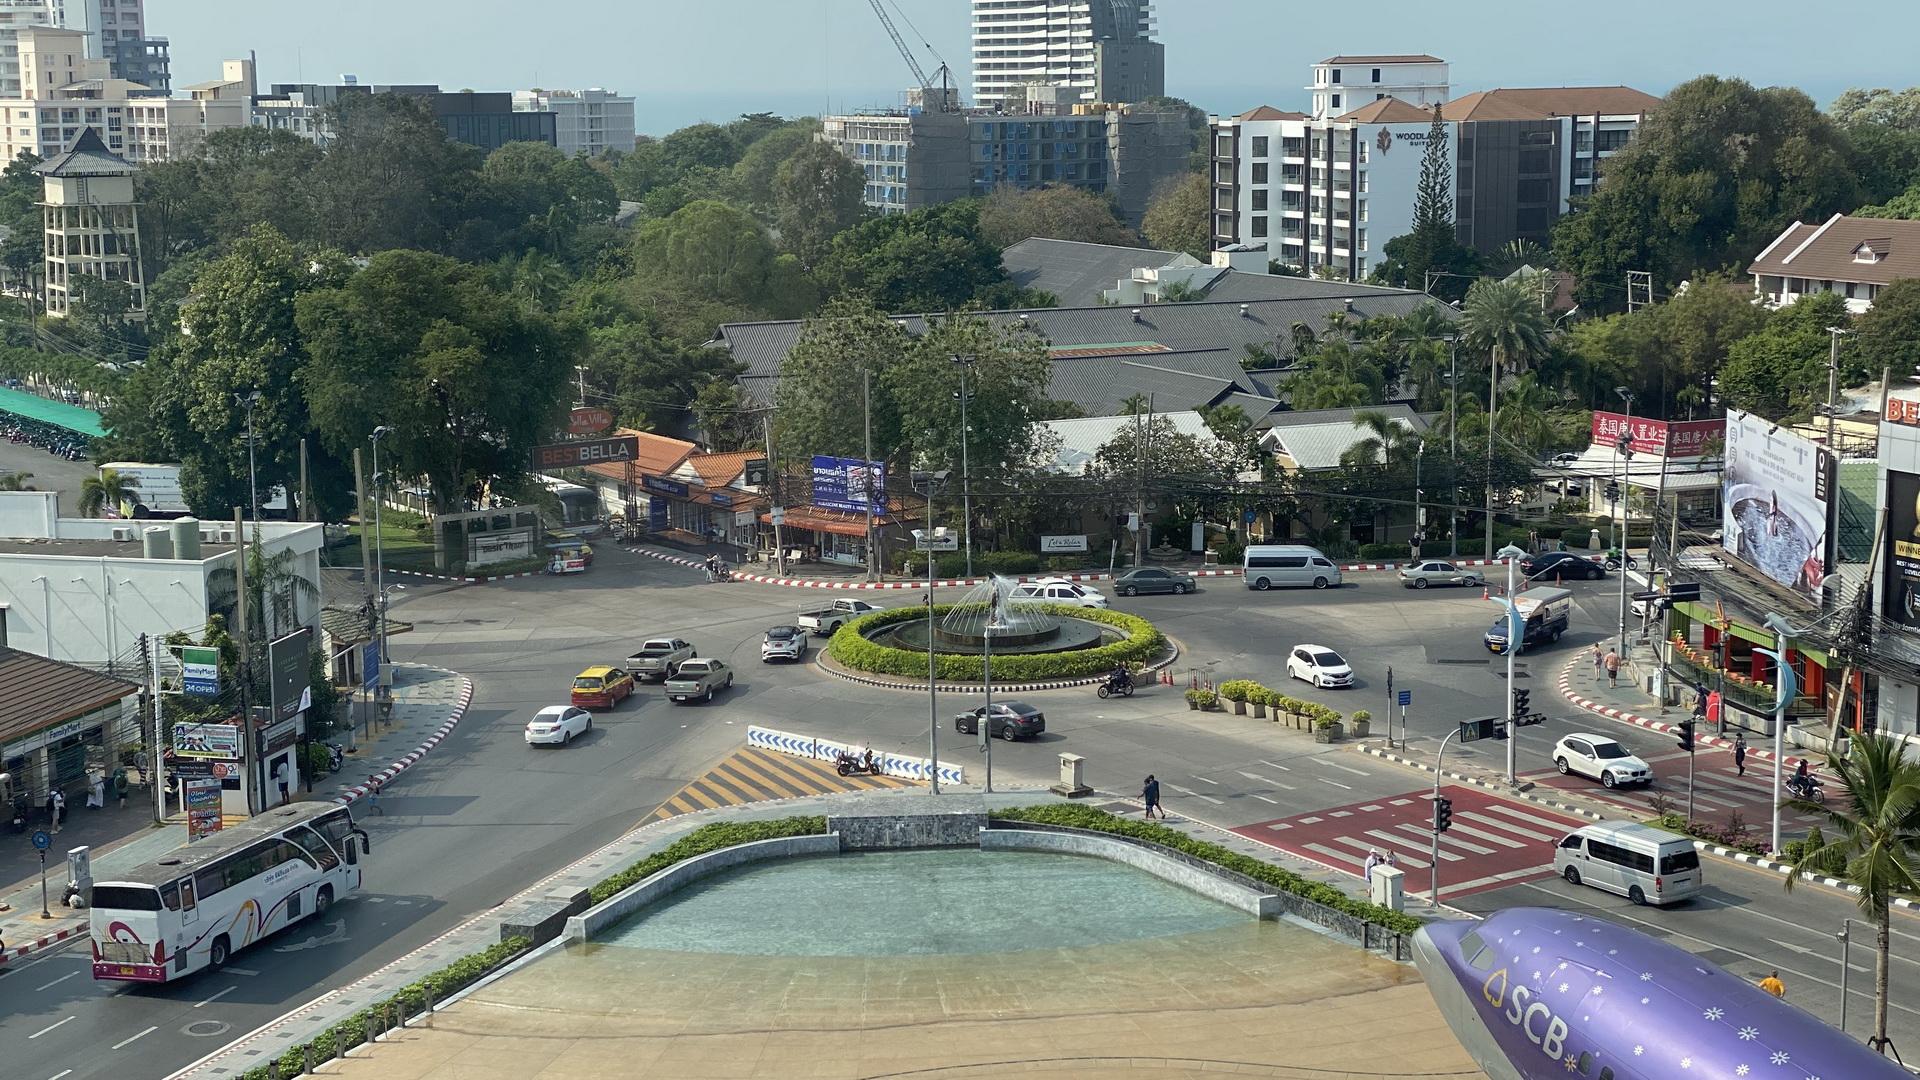 Kreisverkehr in Naklua Pattaya von oben